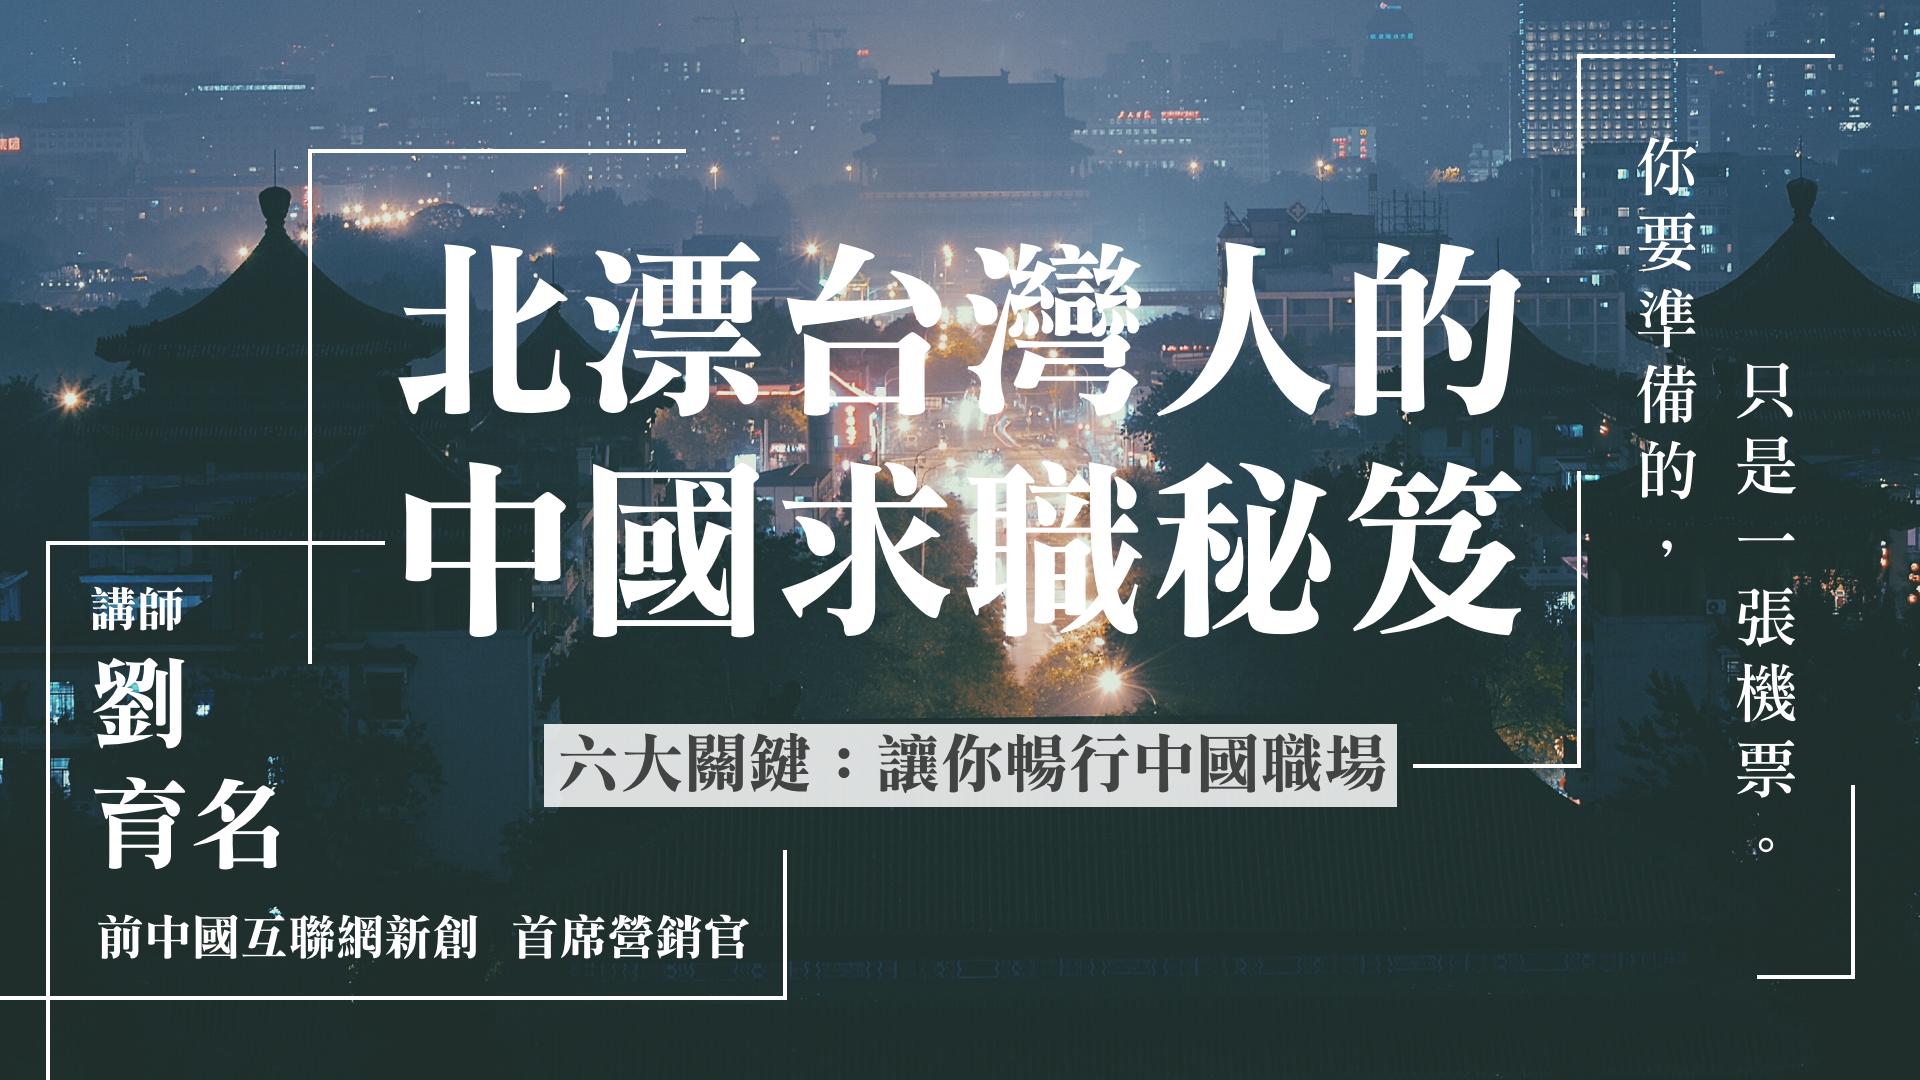 Comma - 北漂台灣人的中國求職秘笈